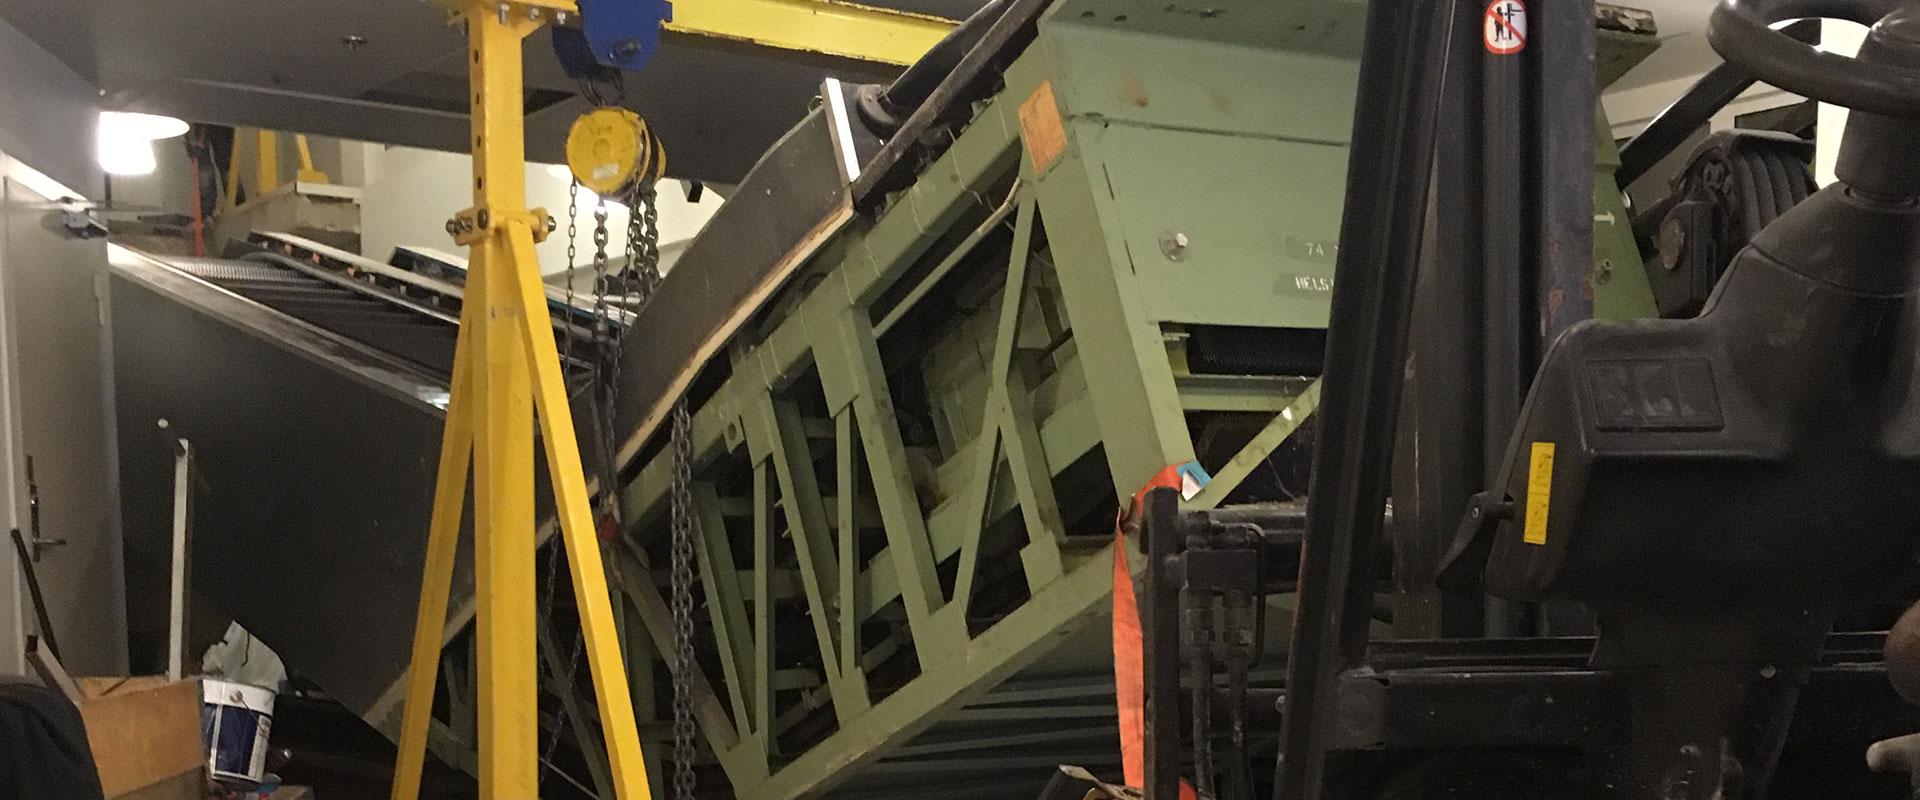 Dismantling of 2 old escalators in Helsingborg